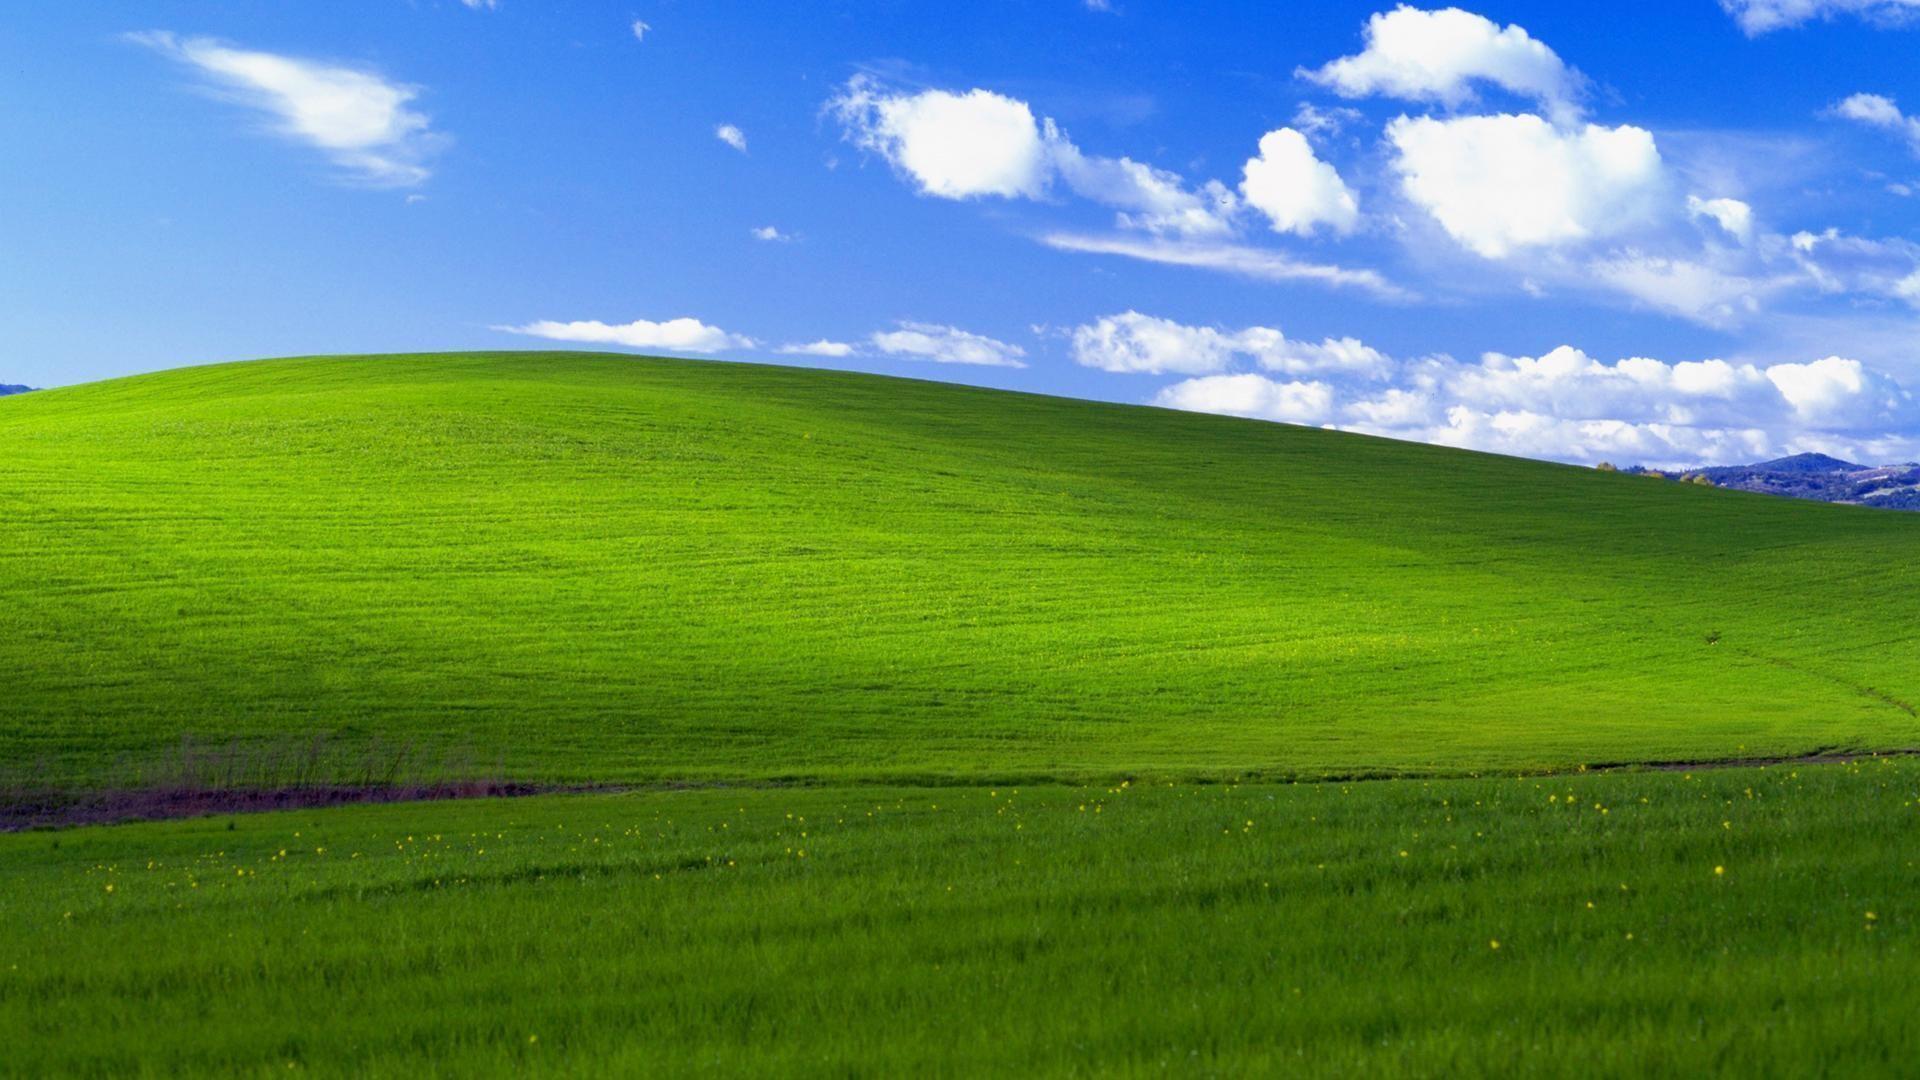 Windows Xp 1920x1080 Windows Wallpaper Windows Desktop Wallpaper Backgrounds Desktop